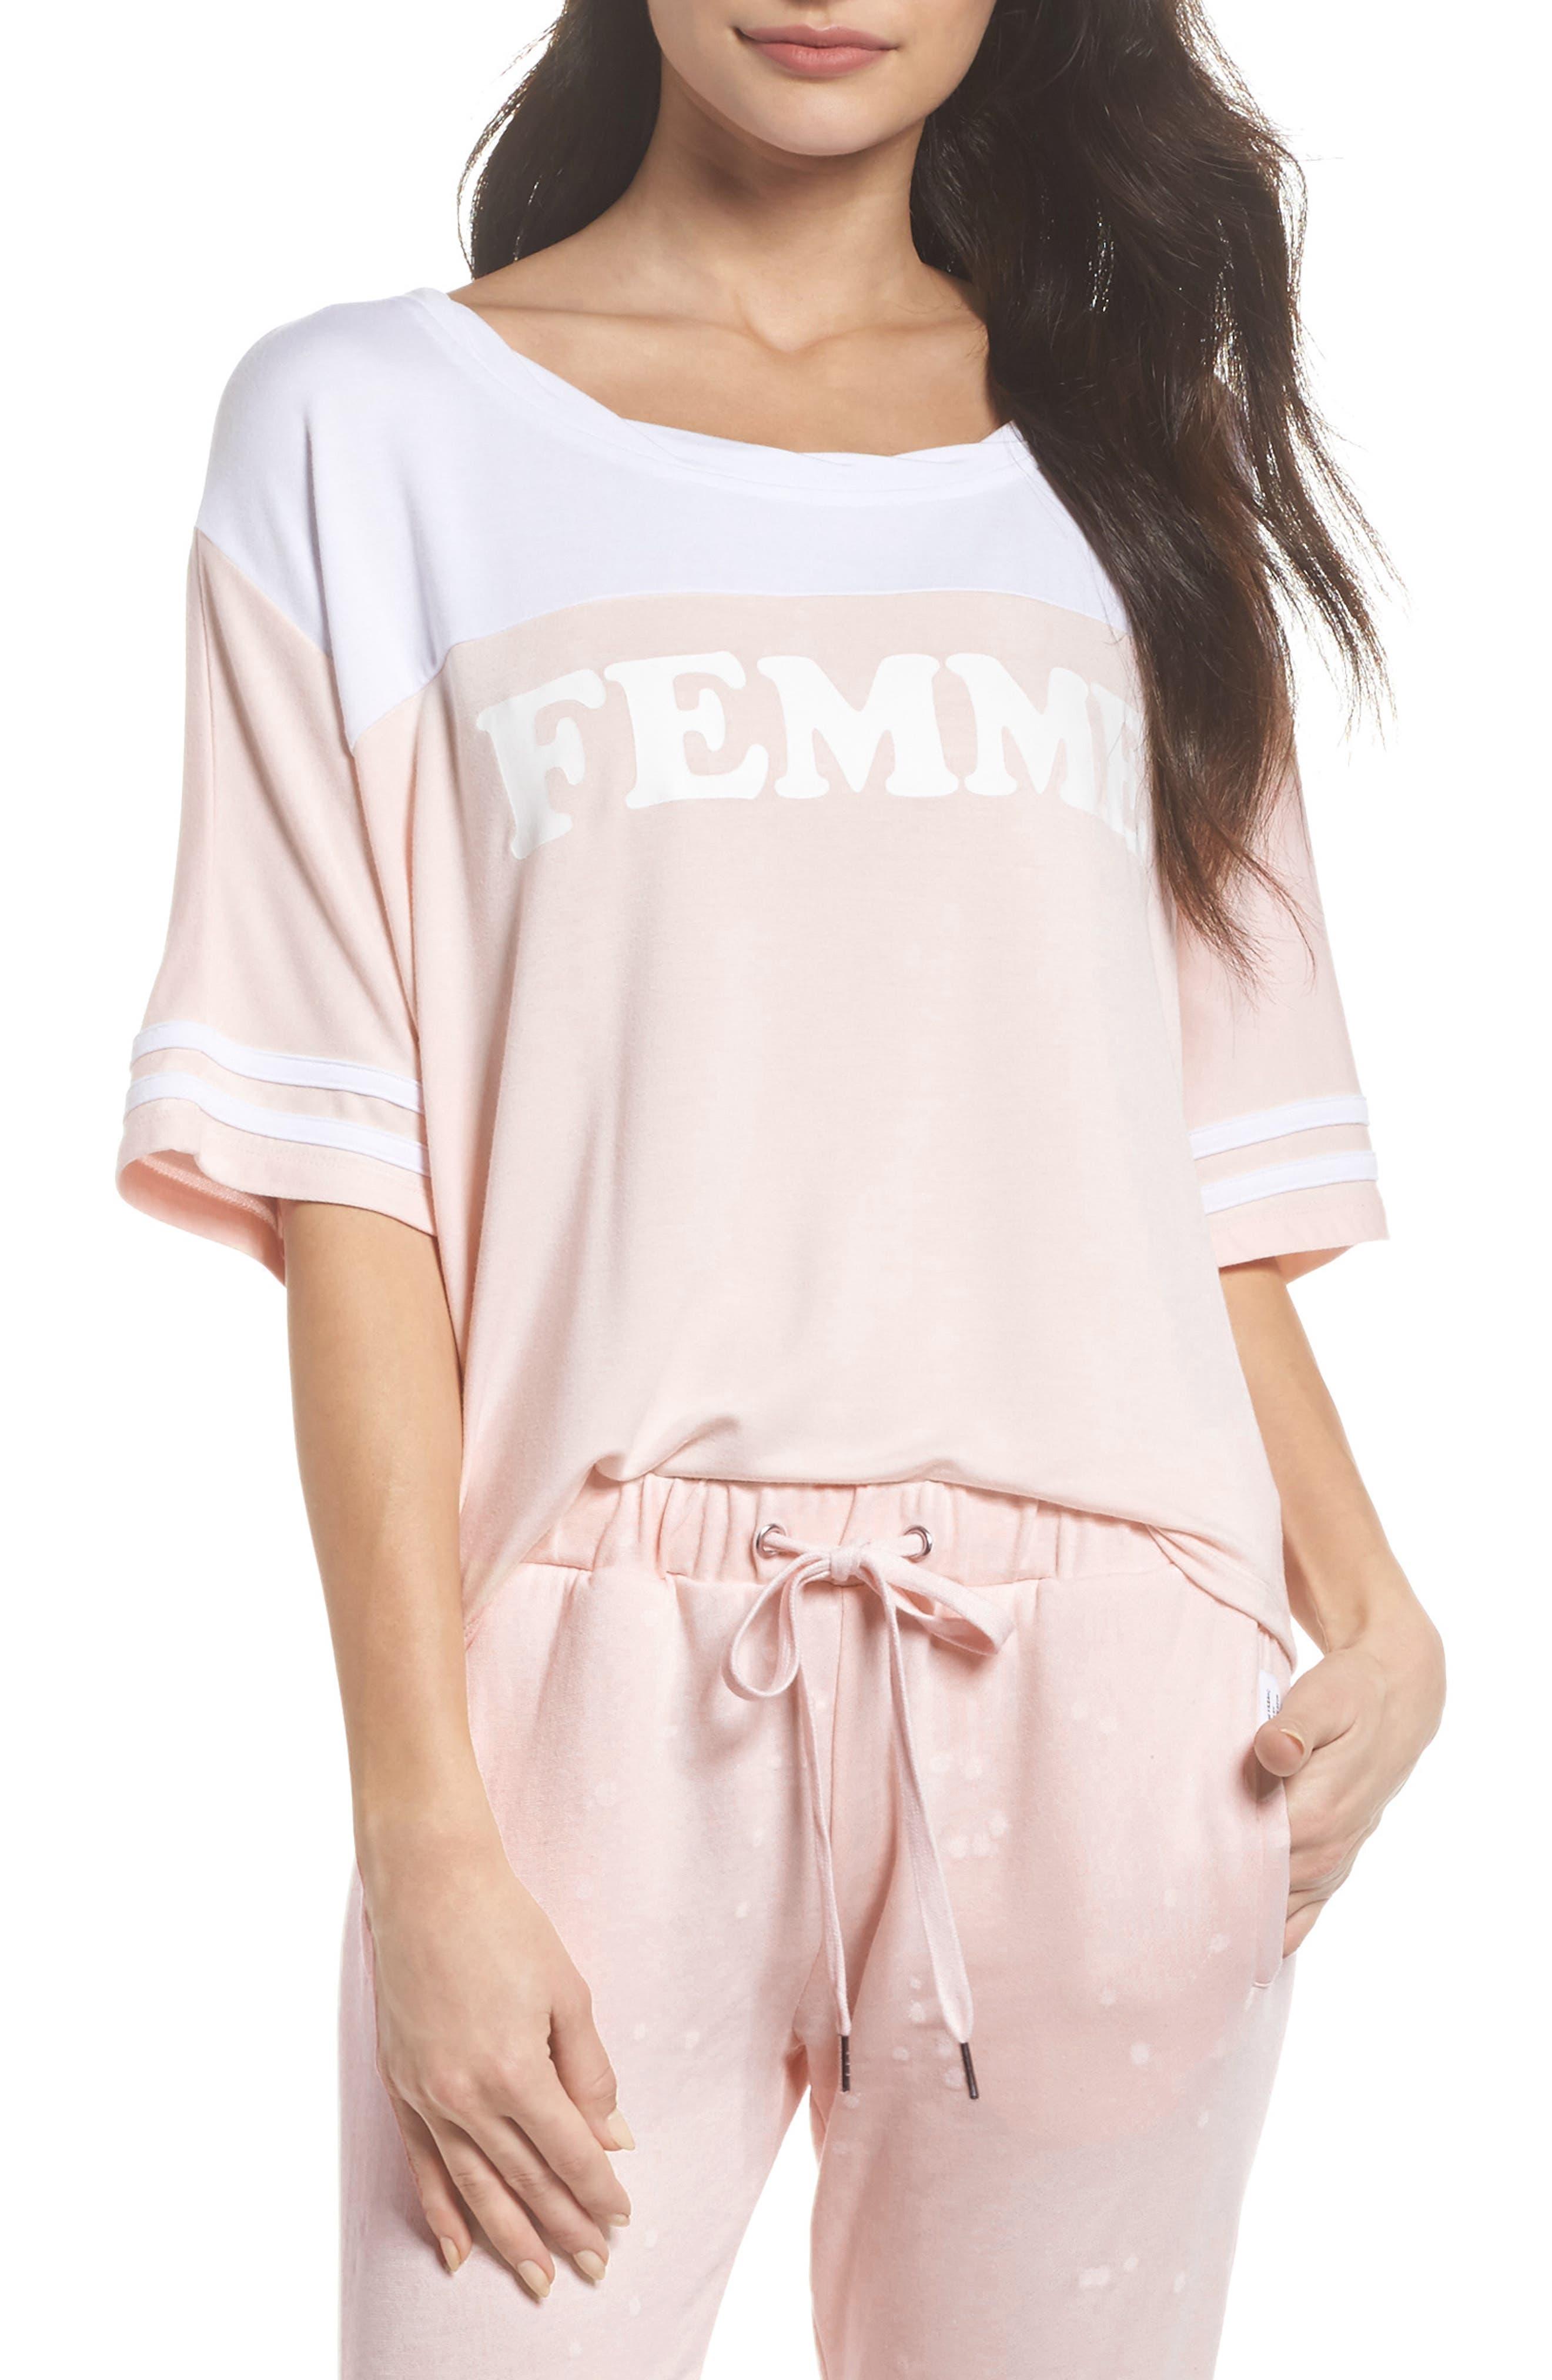 Team Femme Baggy Tee,                             Main thumbnail 1, color,                             Shell/ White